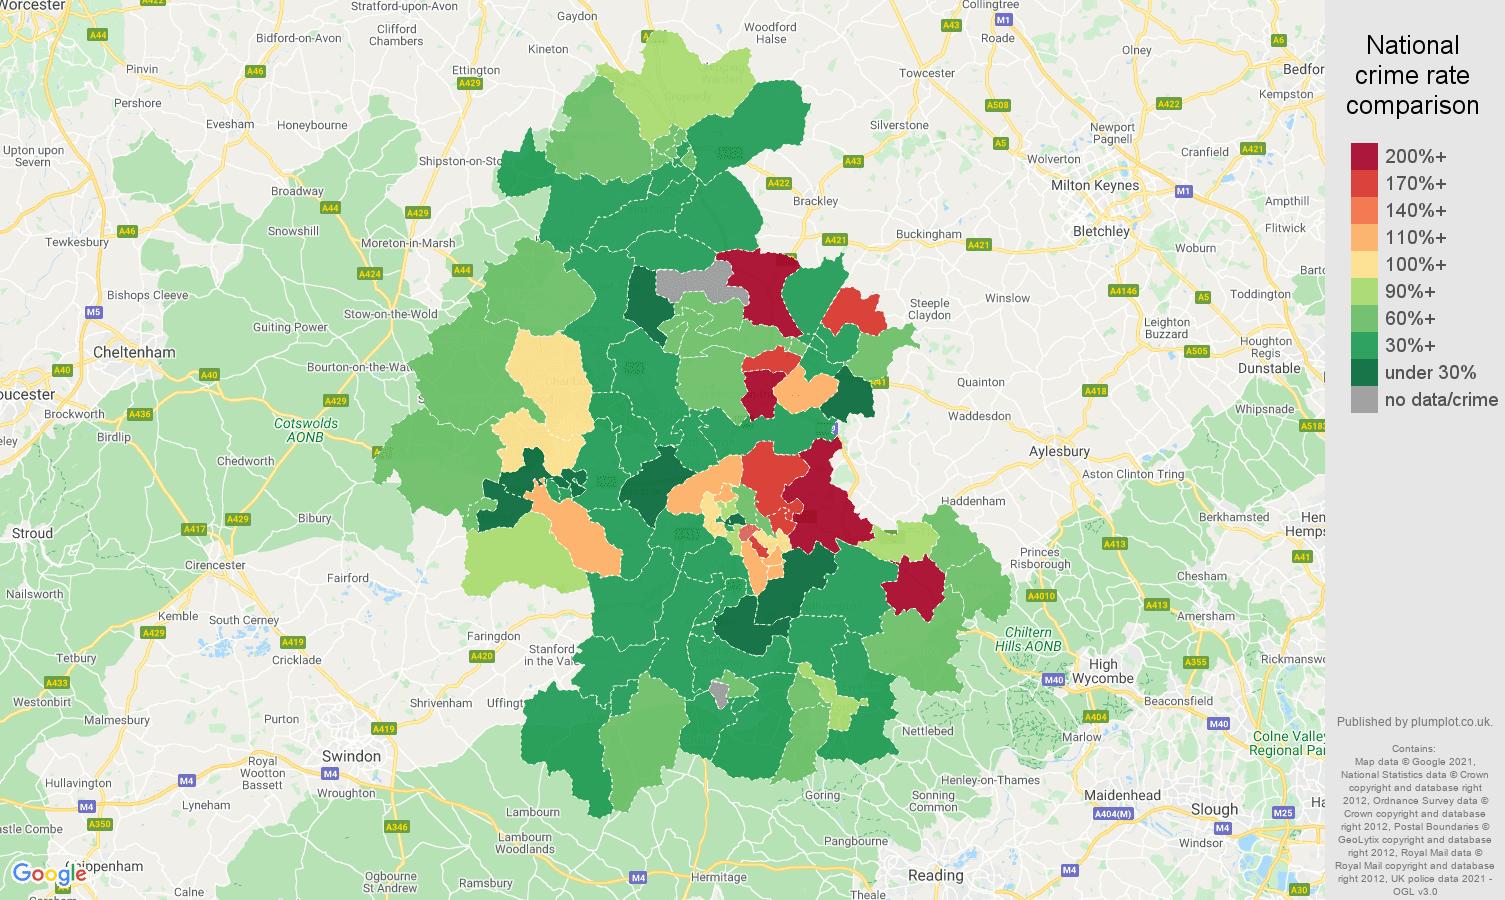 Oxford vehicle crime rate comparison map